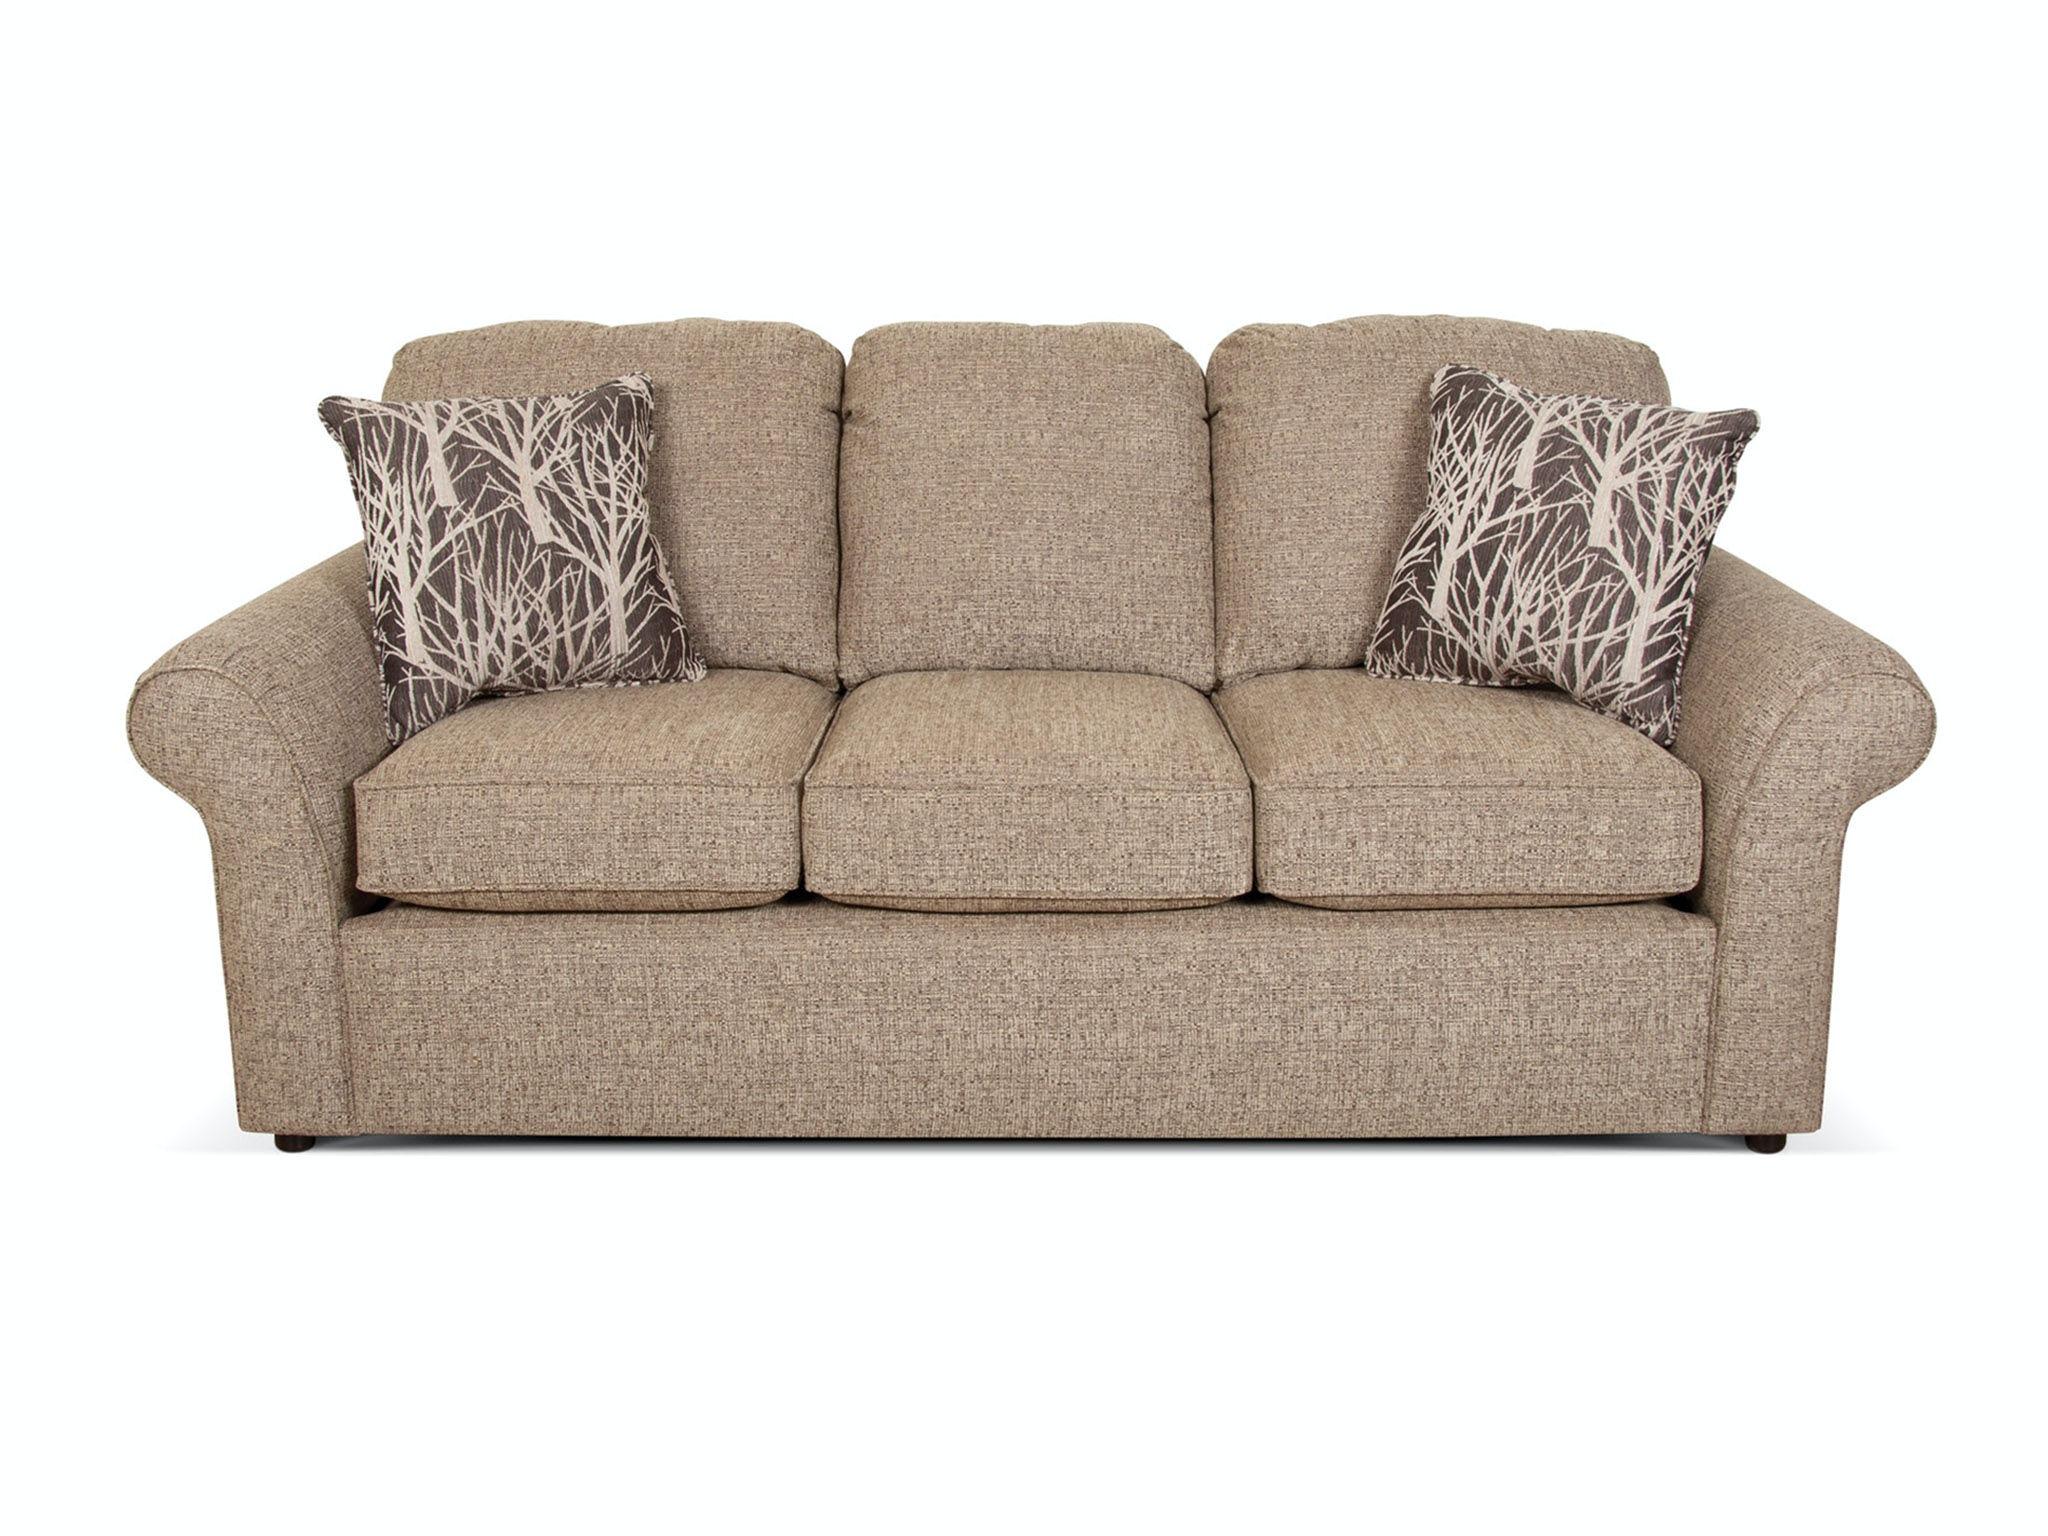 2405. Malibu Sofa